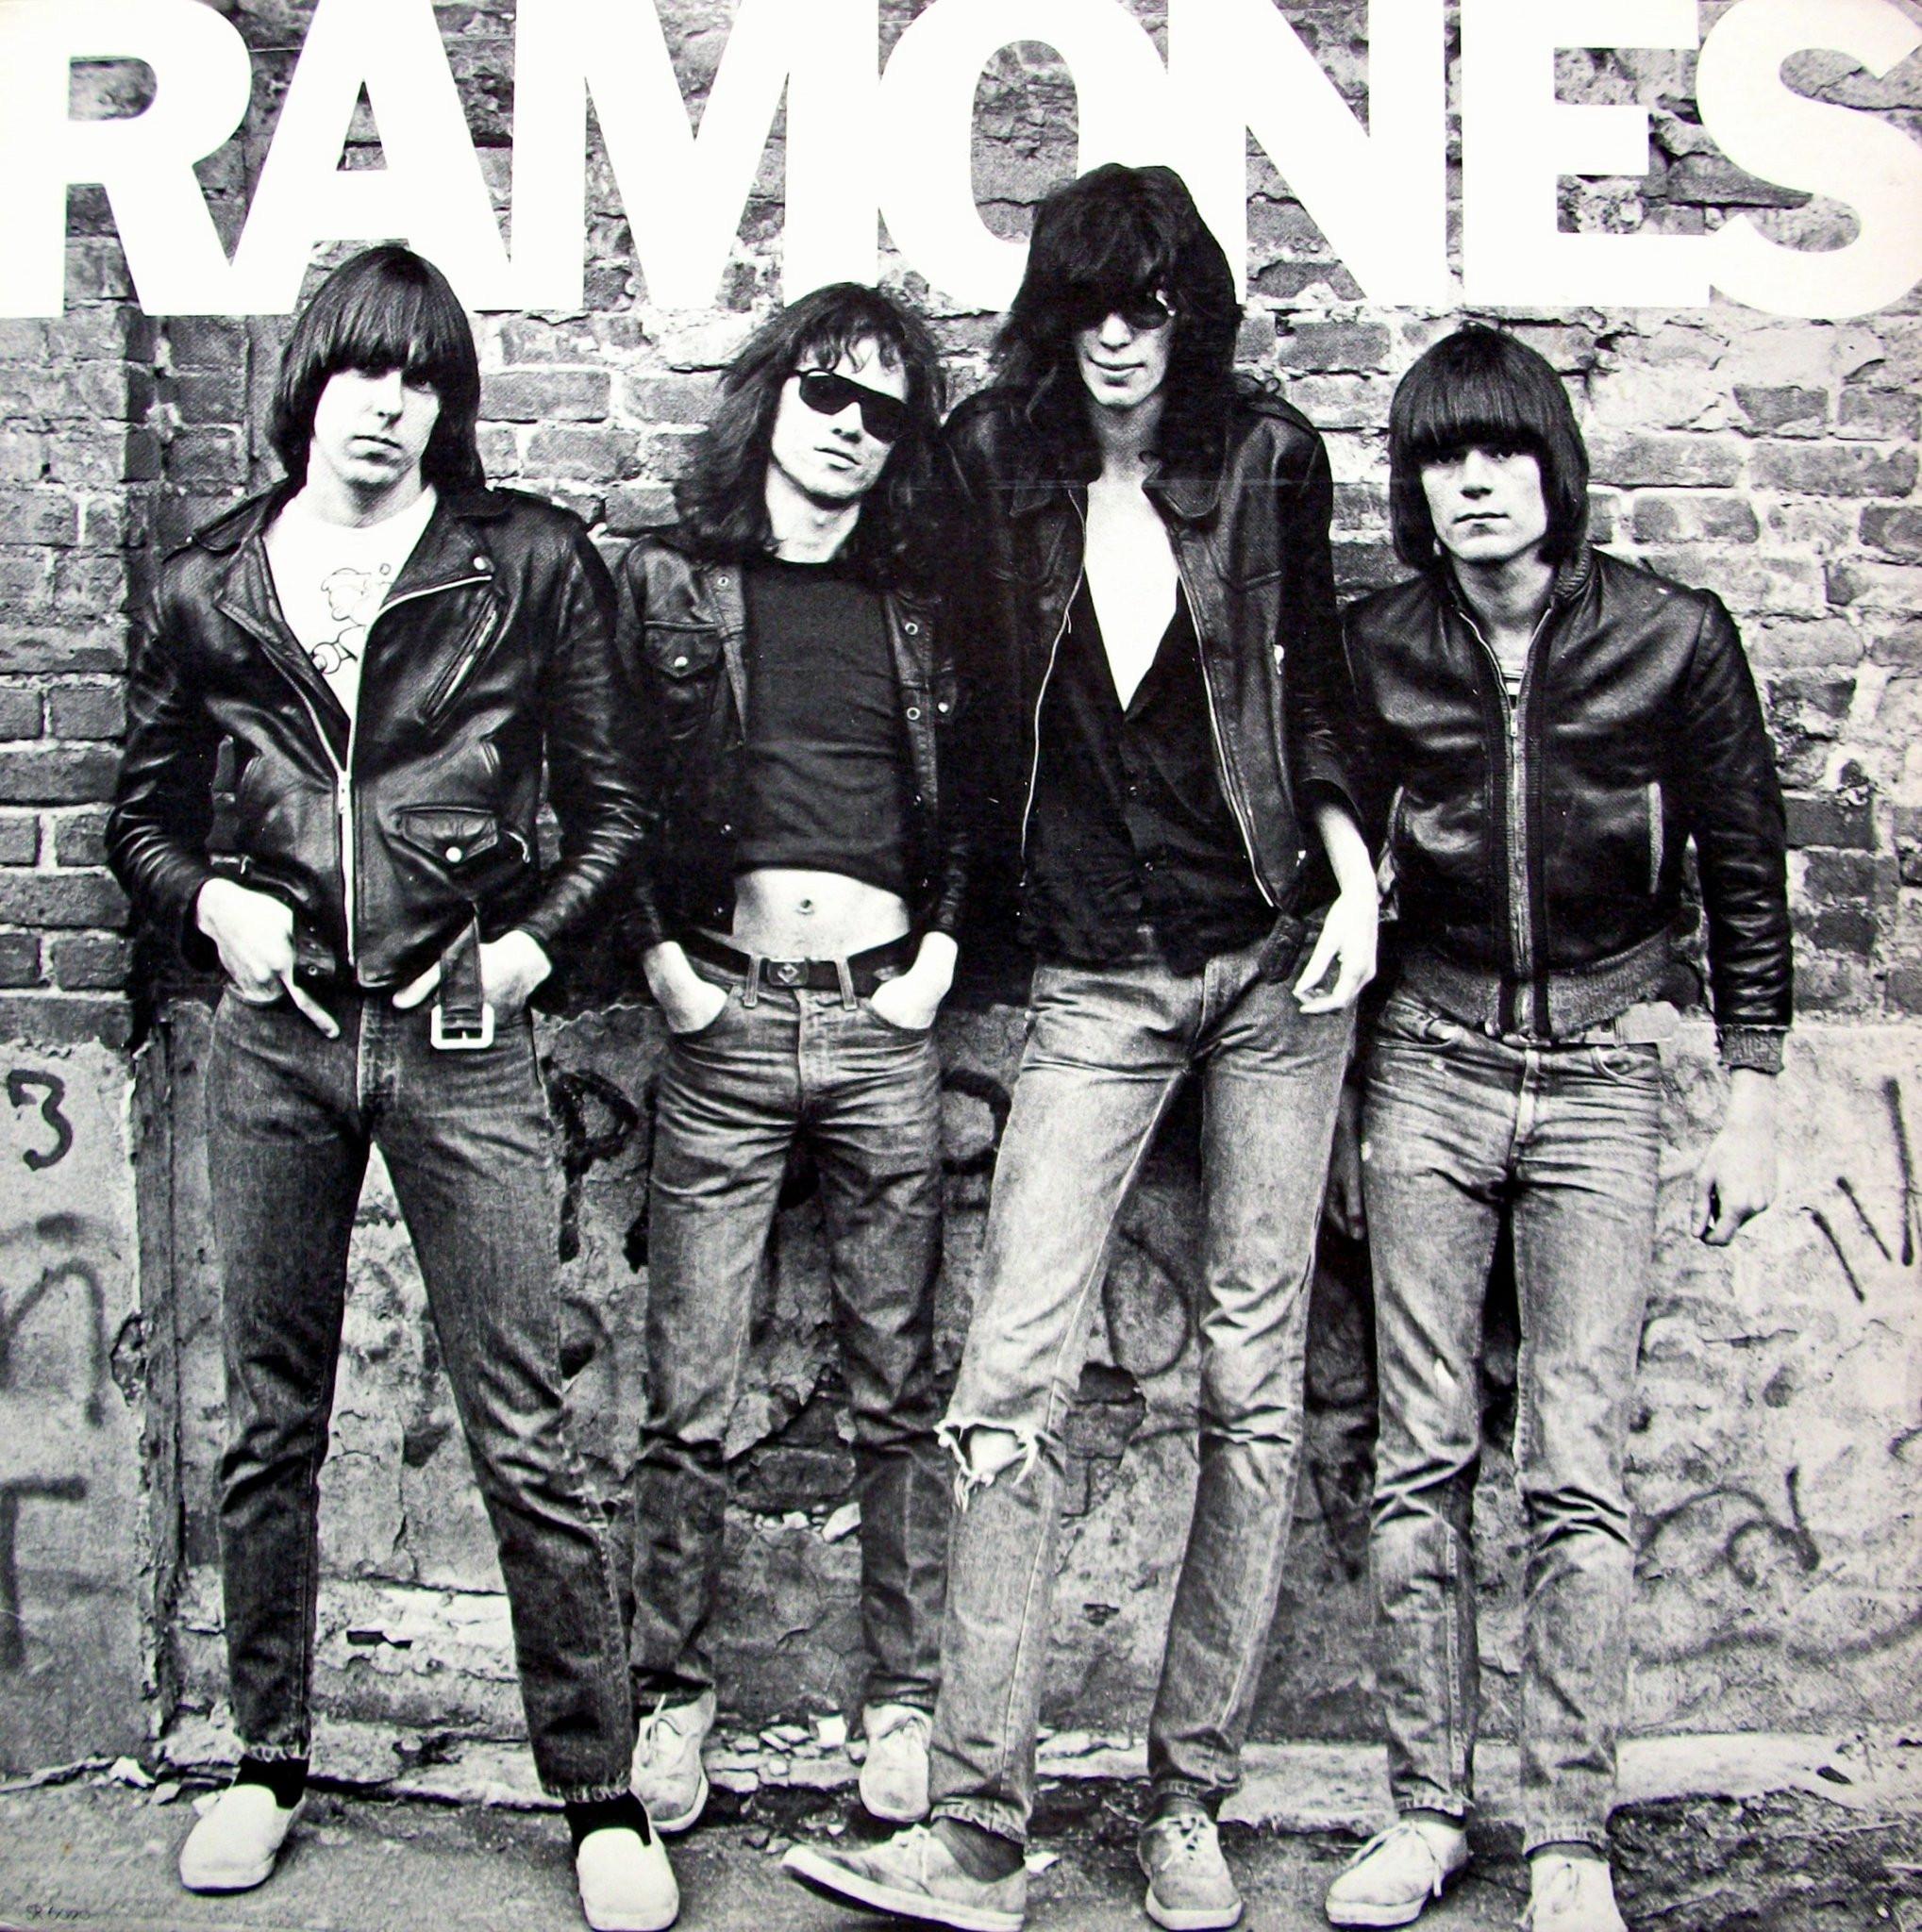 Ramones_b105eb0c-74fe-47d2-9f60-d91c62825021